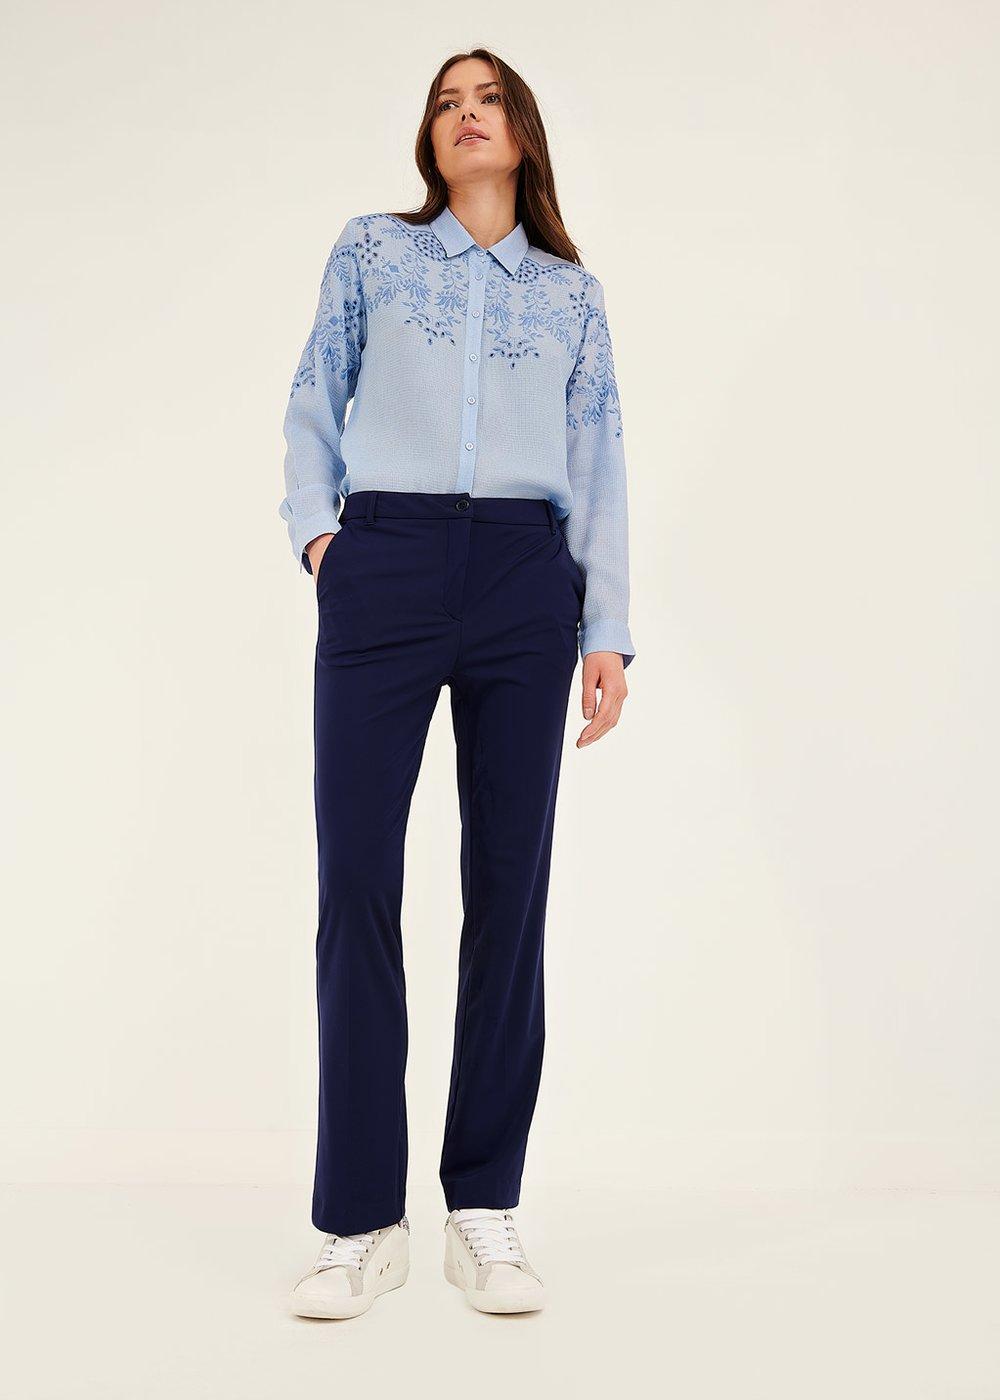 Jacquelic trousers in technical fabric - Ultramarine - Woman